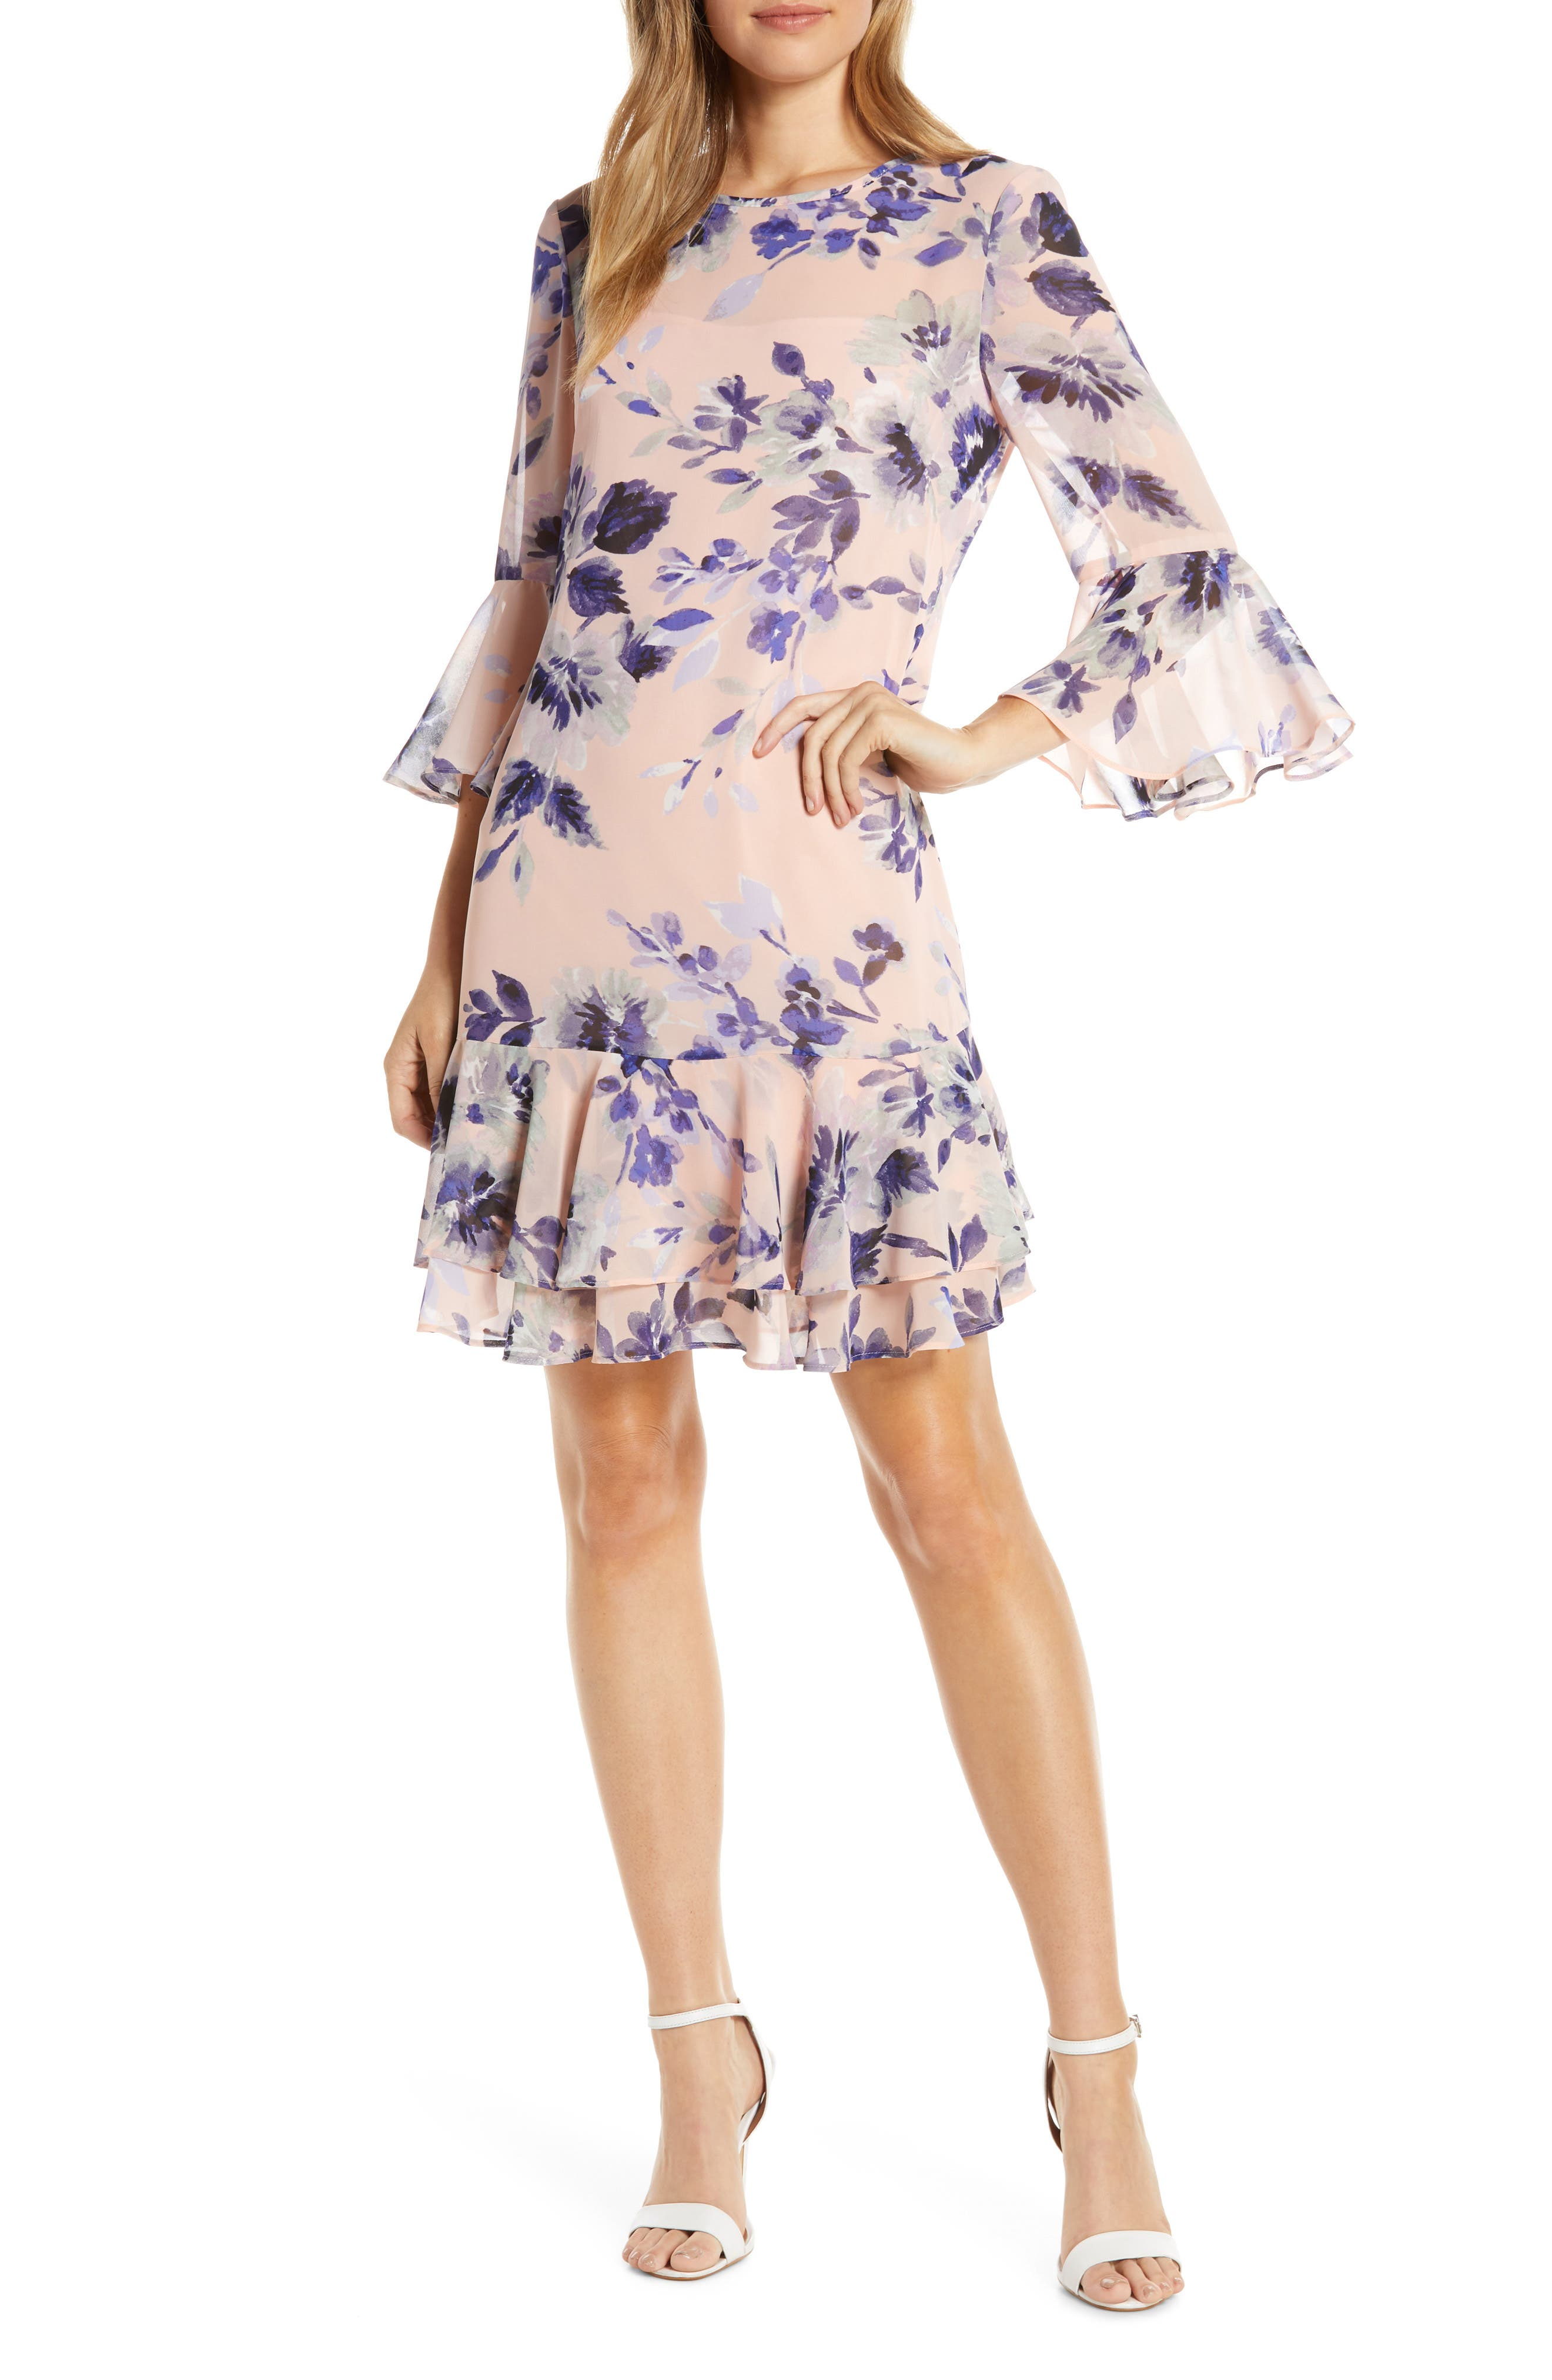 1920s Day Dresses, Tea Dresses, Mature Dresses with Sleeves Womens Eliza J Floral Chiffon Flounce Dress Size 10 - Pink $100.80 AT vintagedancer.com